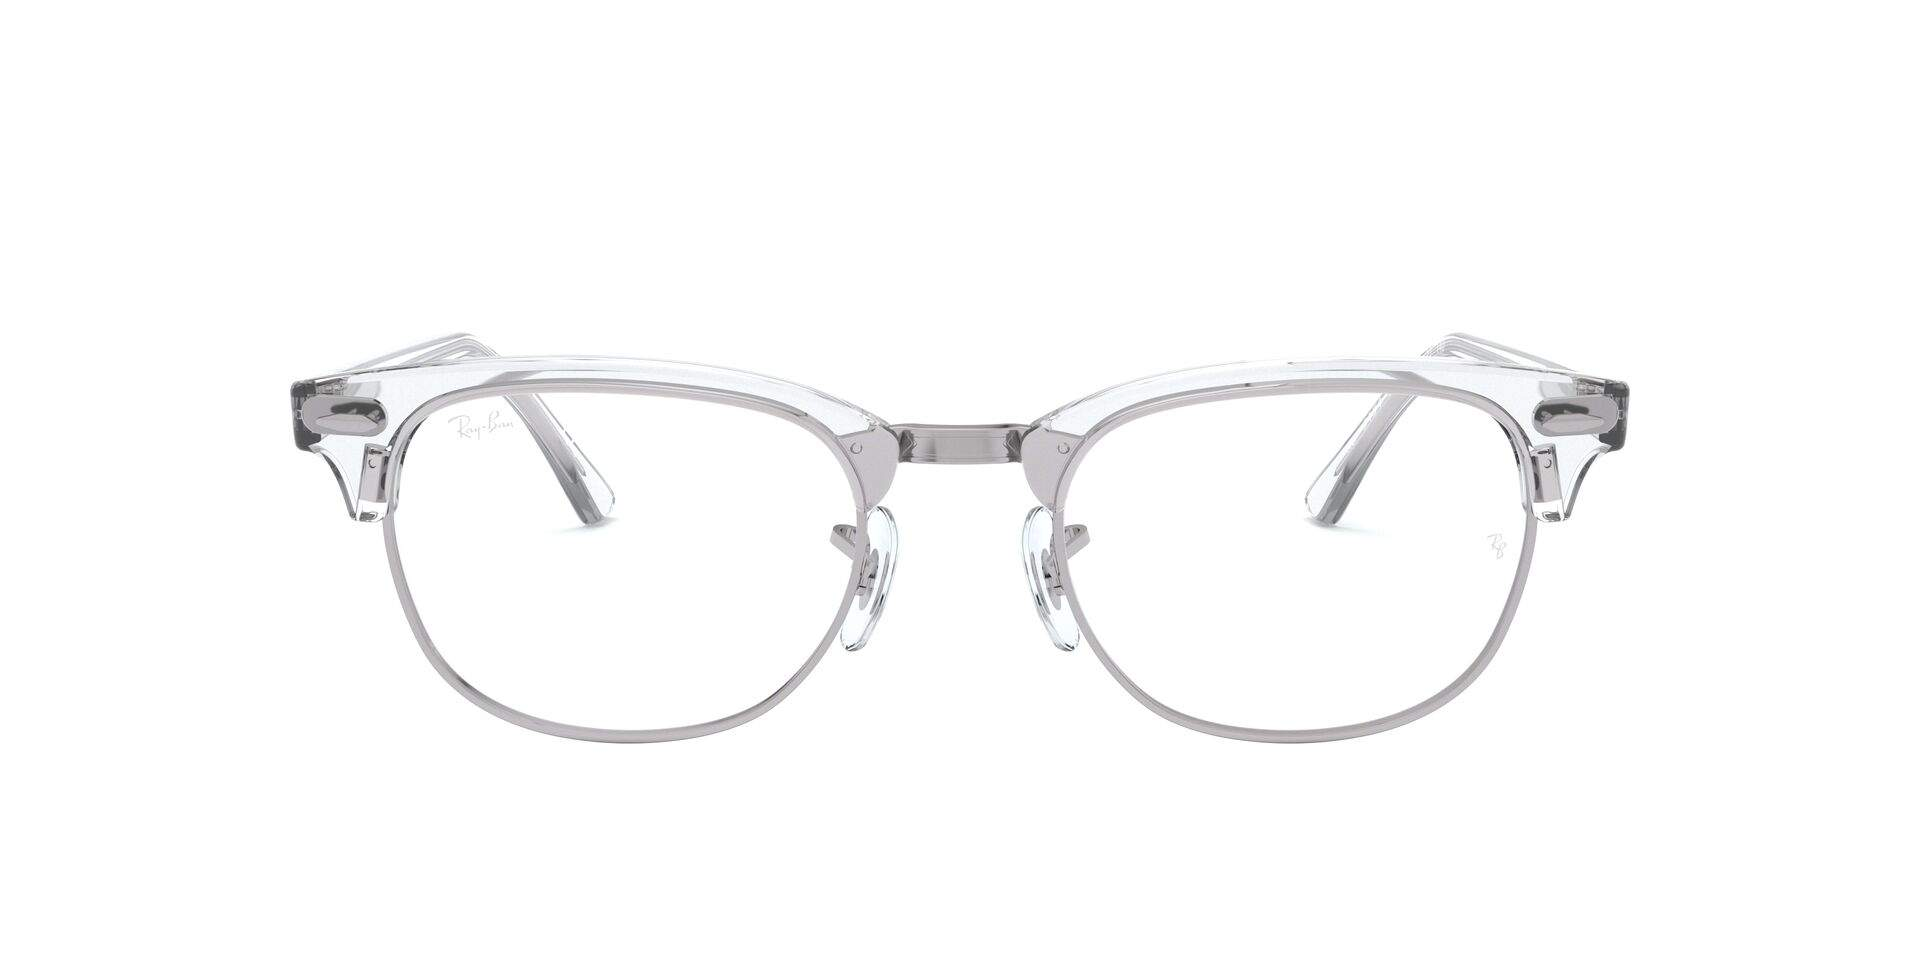 e52ae2895bb16 Eyeglasses Ray-Ban Clubmaster Optics Clear RX5154 2001 49-21 Medium